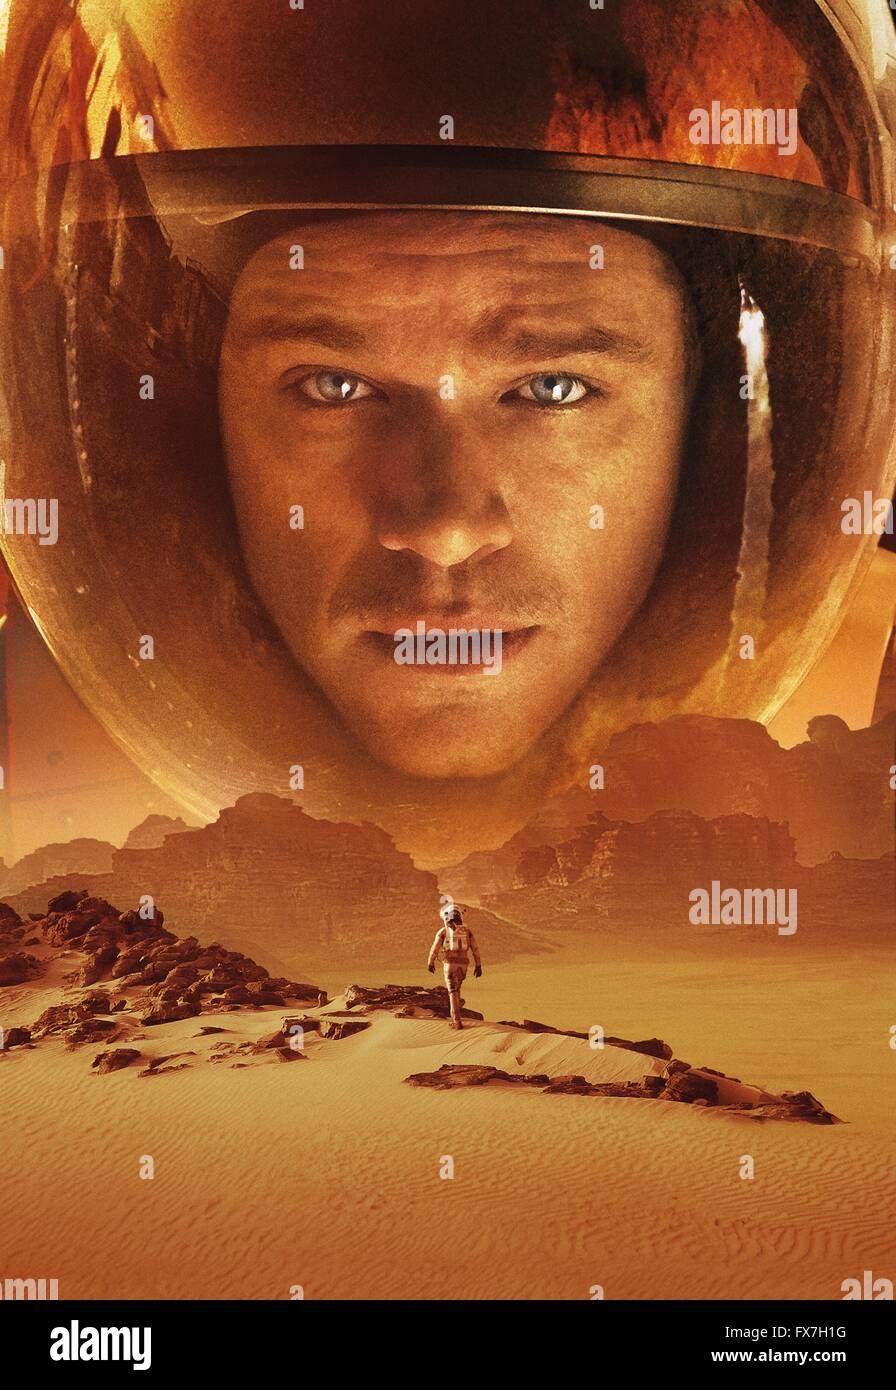 The Martian Year : 2015 USA Director : Ridley Scott Matt Damon Art Work - Stock Image